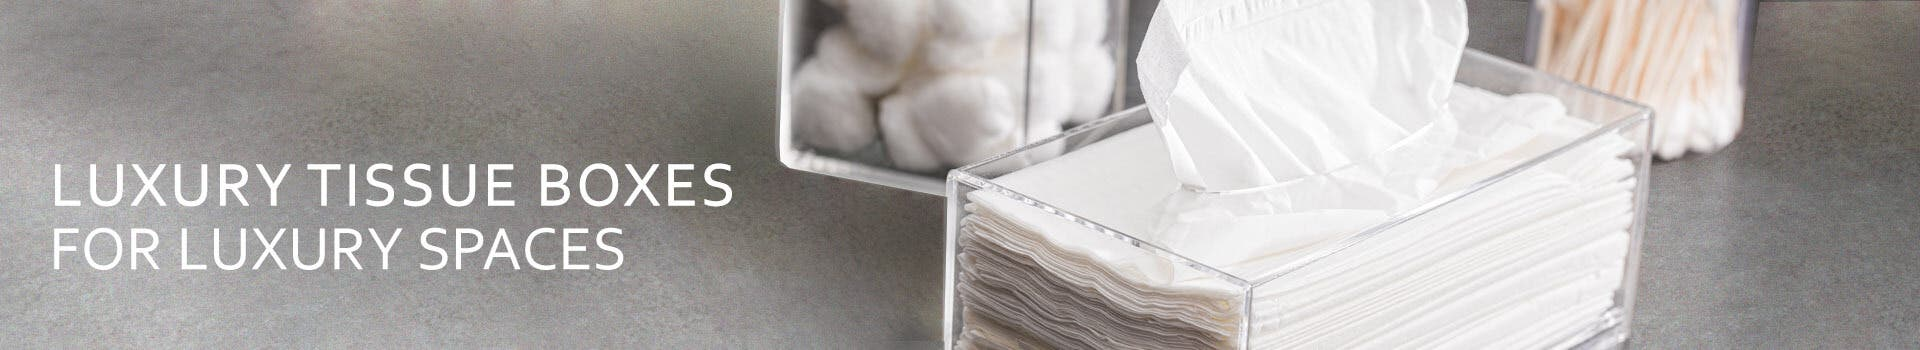 Acrylic Tissue Boxes